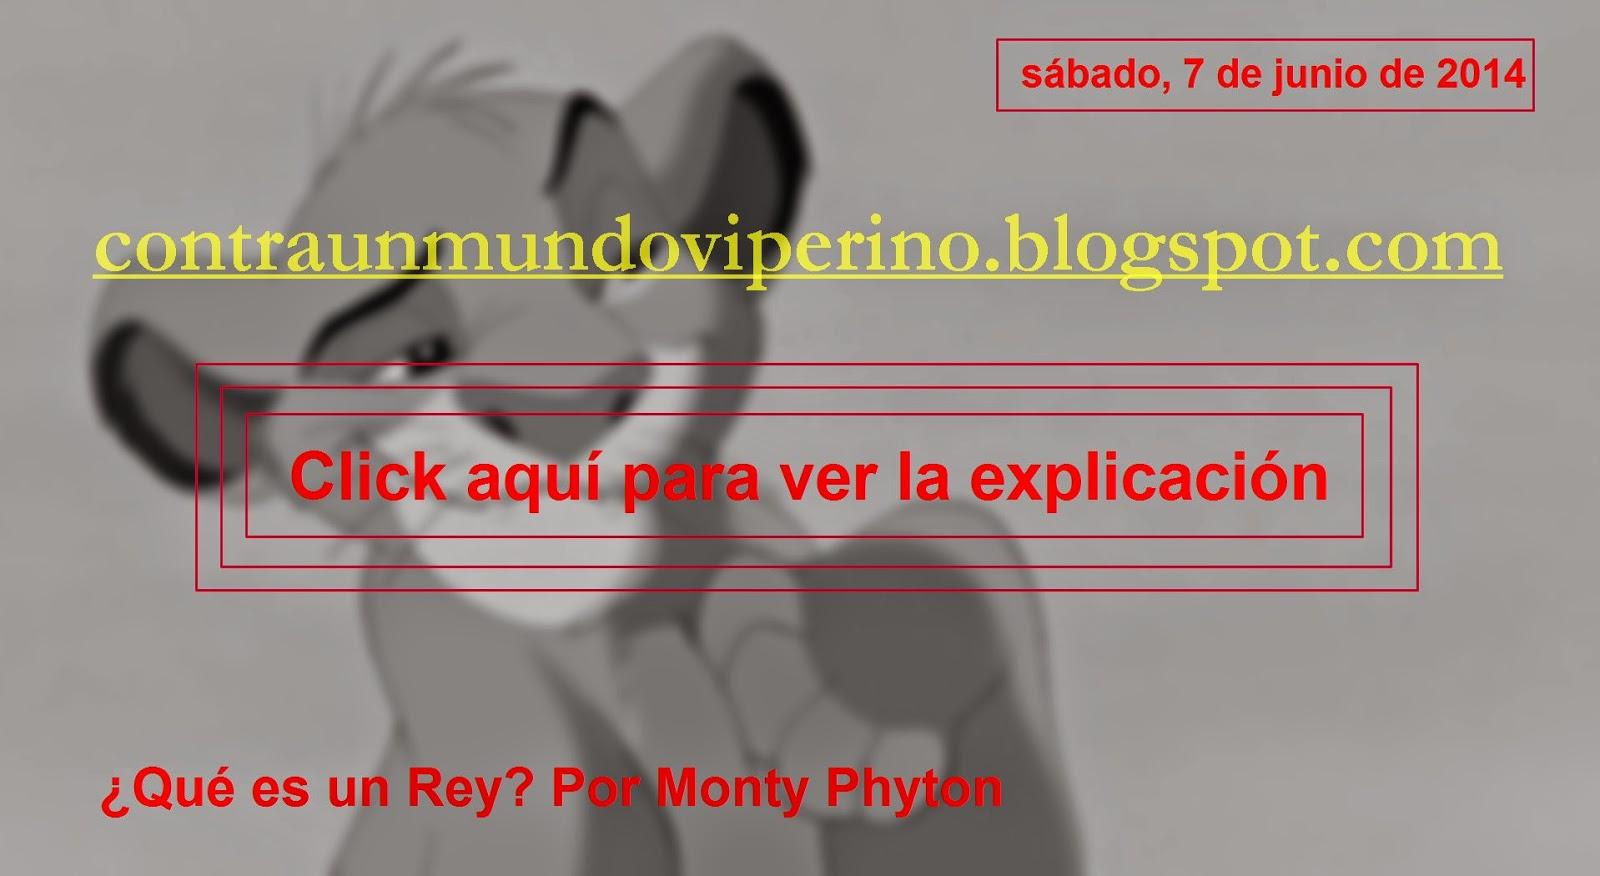 http://contraunmundoviperino.blogspot.com.es/2014/06/la-princesa-letizia-va-dormir-como-una.html